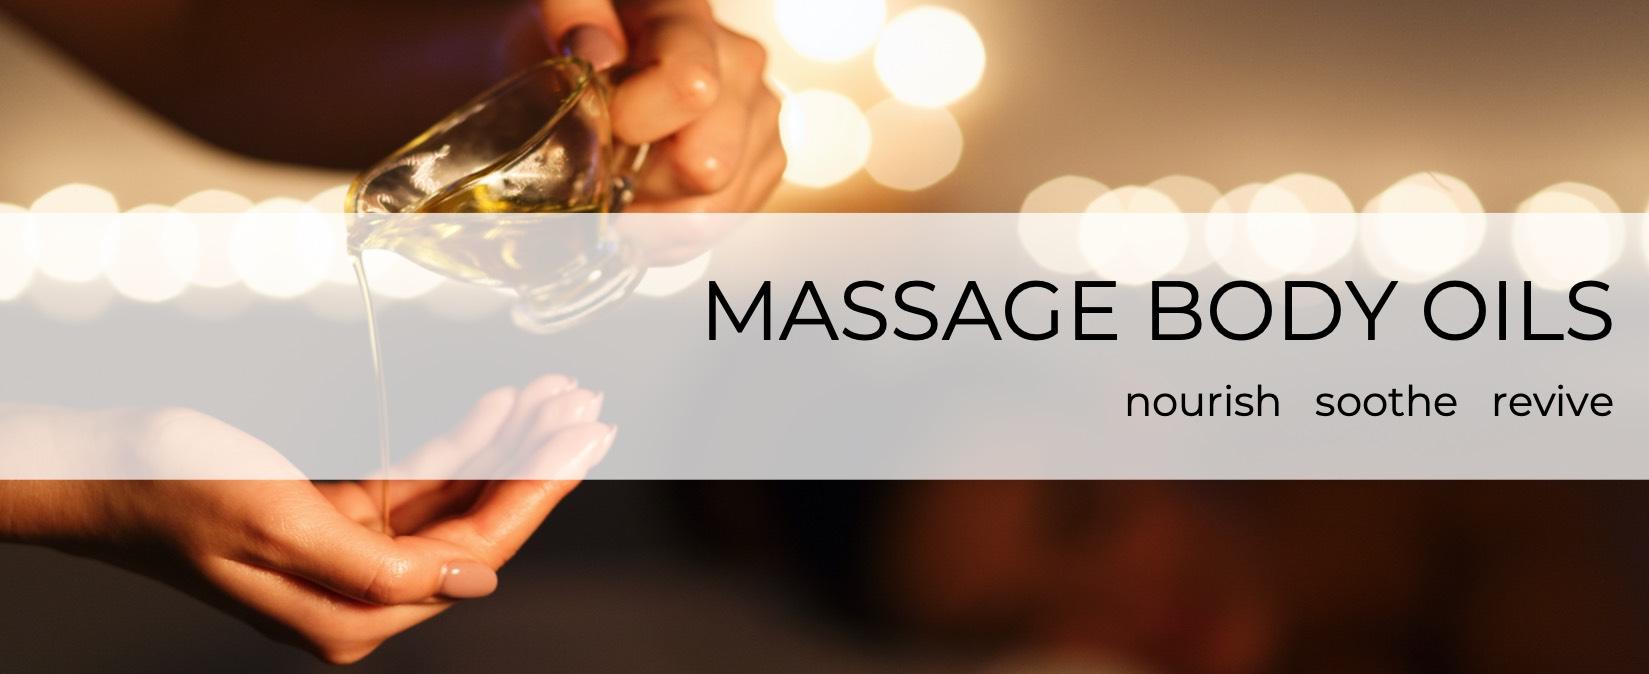 massage body oils jersey city nj salvation wellness